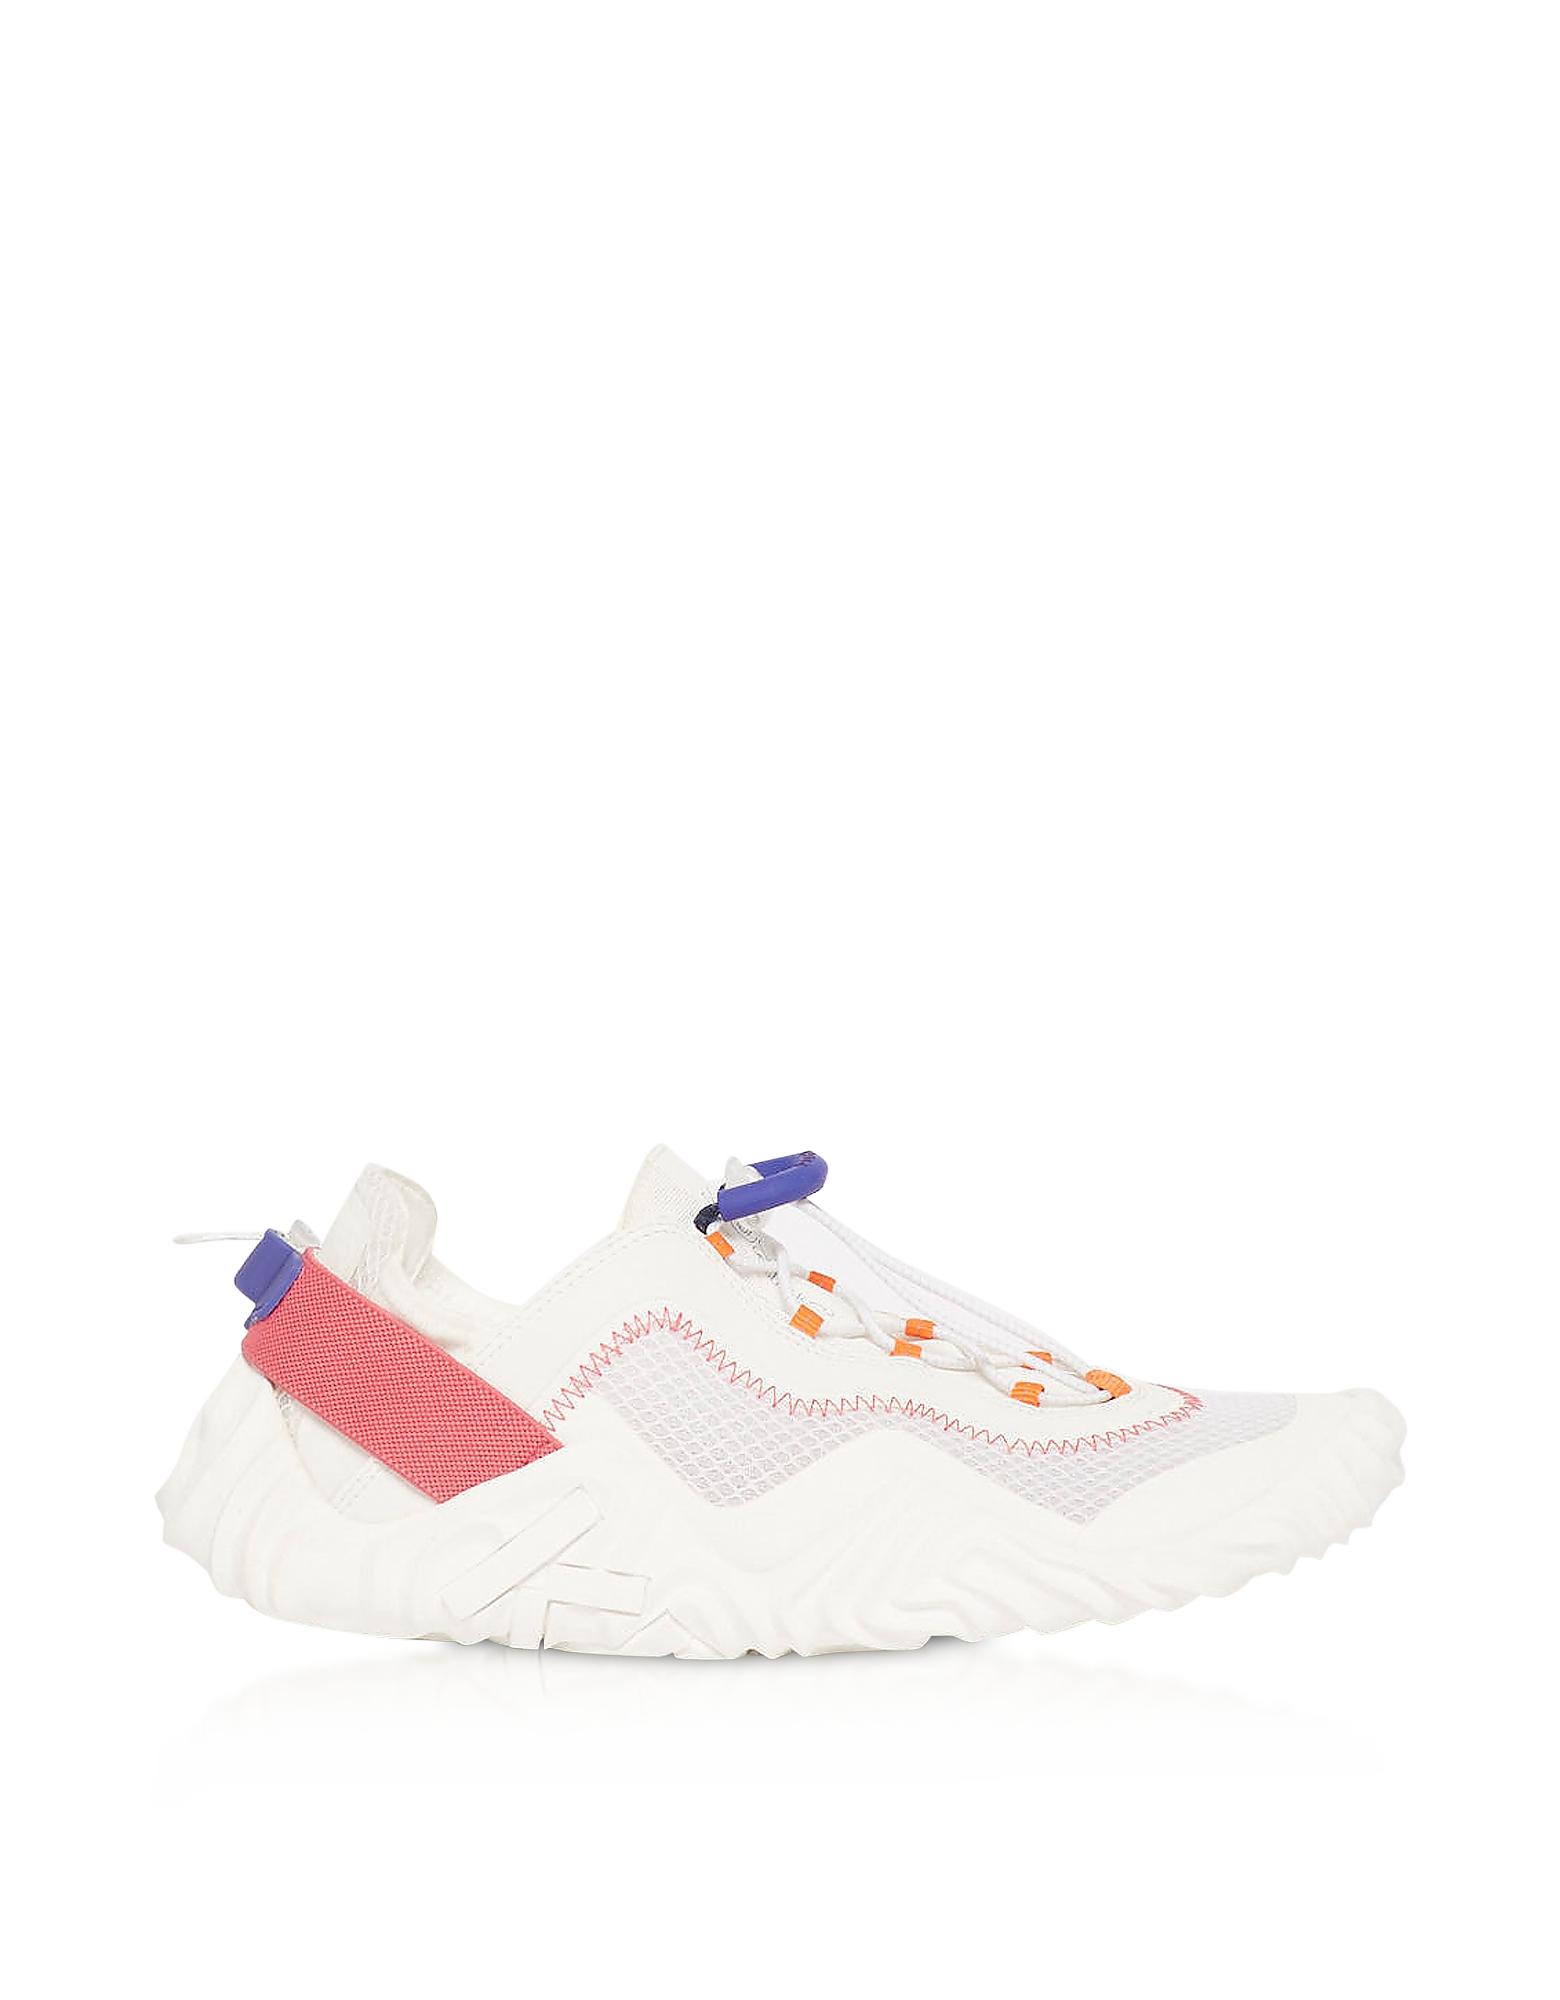 White Mesh Kenzo Wave Low Top Sneakers